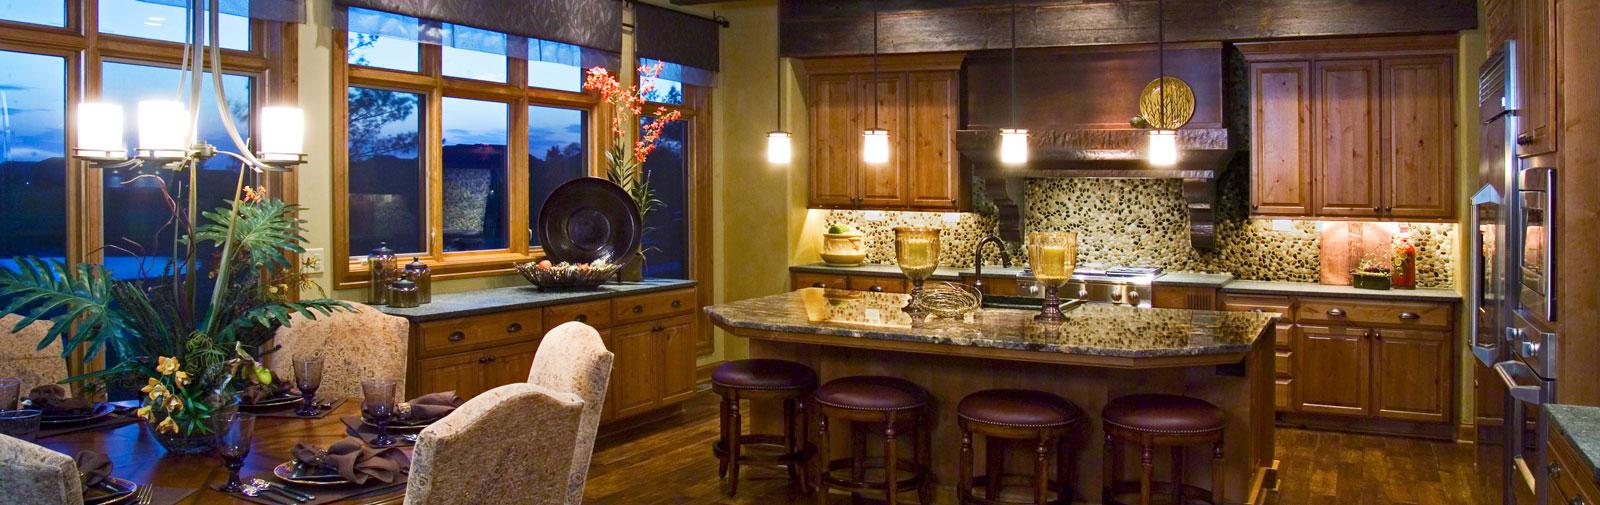 LA-Home-Builders-Lincoln-Nebraska-Amazing-Kitchen-Design.jpg